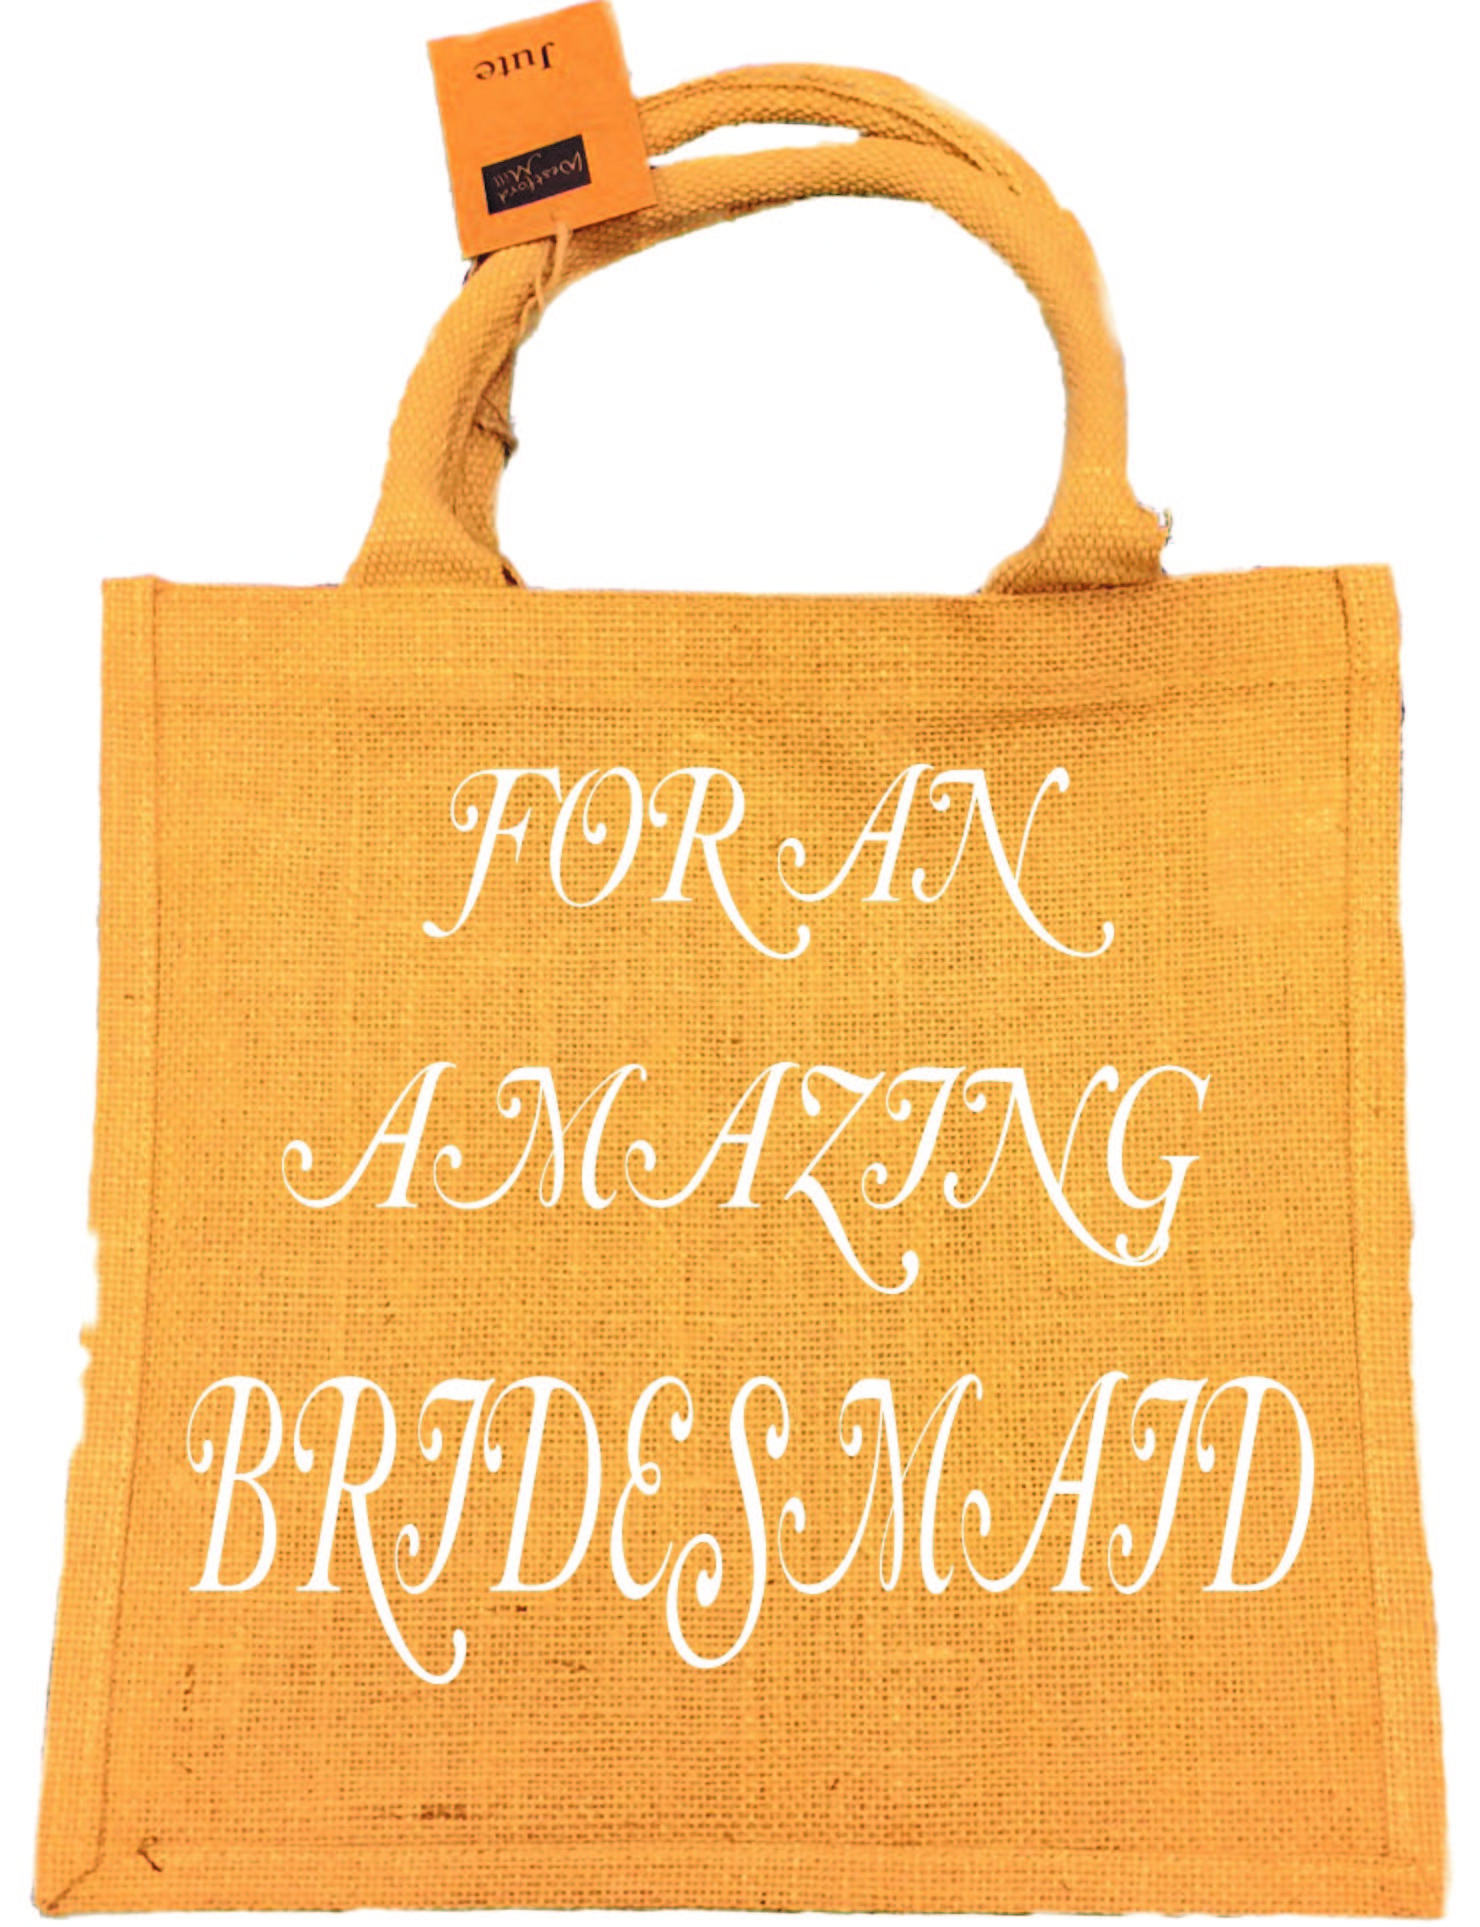 89892047a9f0 amazing-bridesmaid-bag.jpg